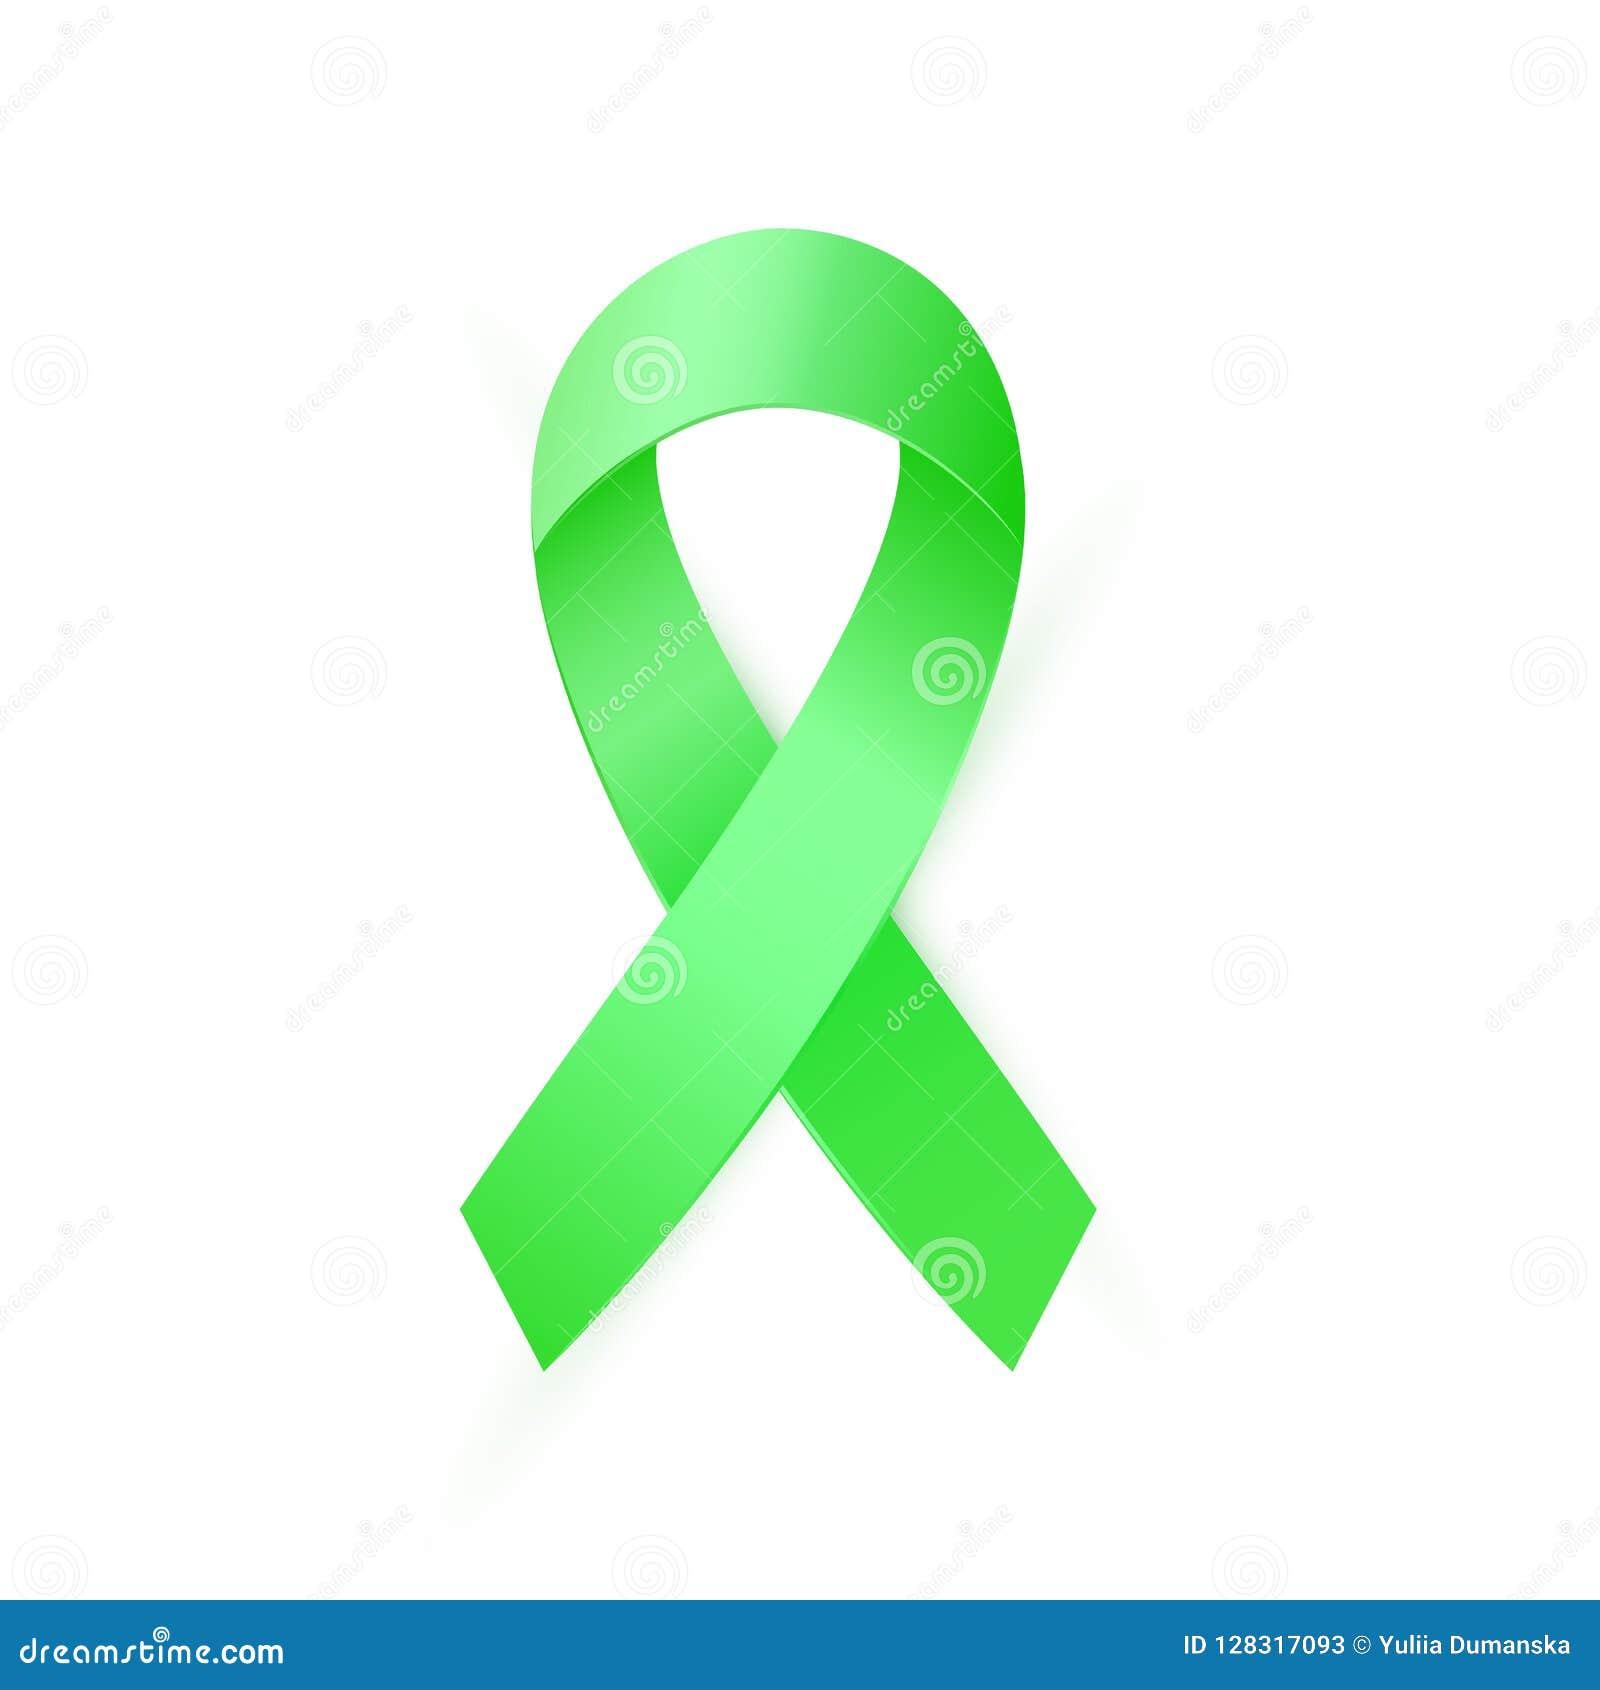 Green Awareness Ribbon For Organ Transplant And Donation Awareness